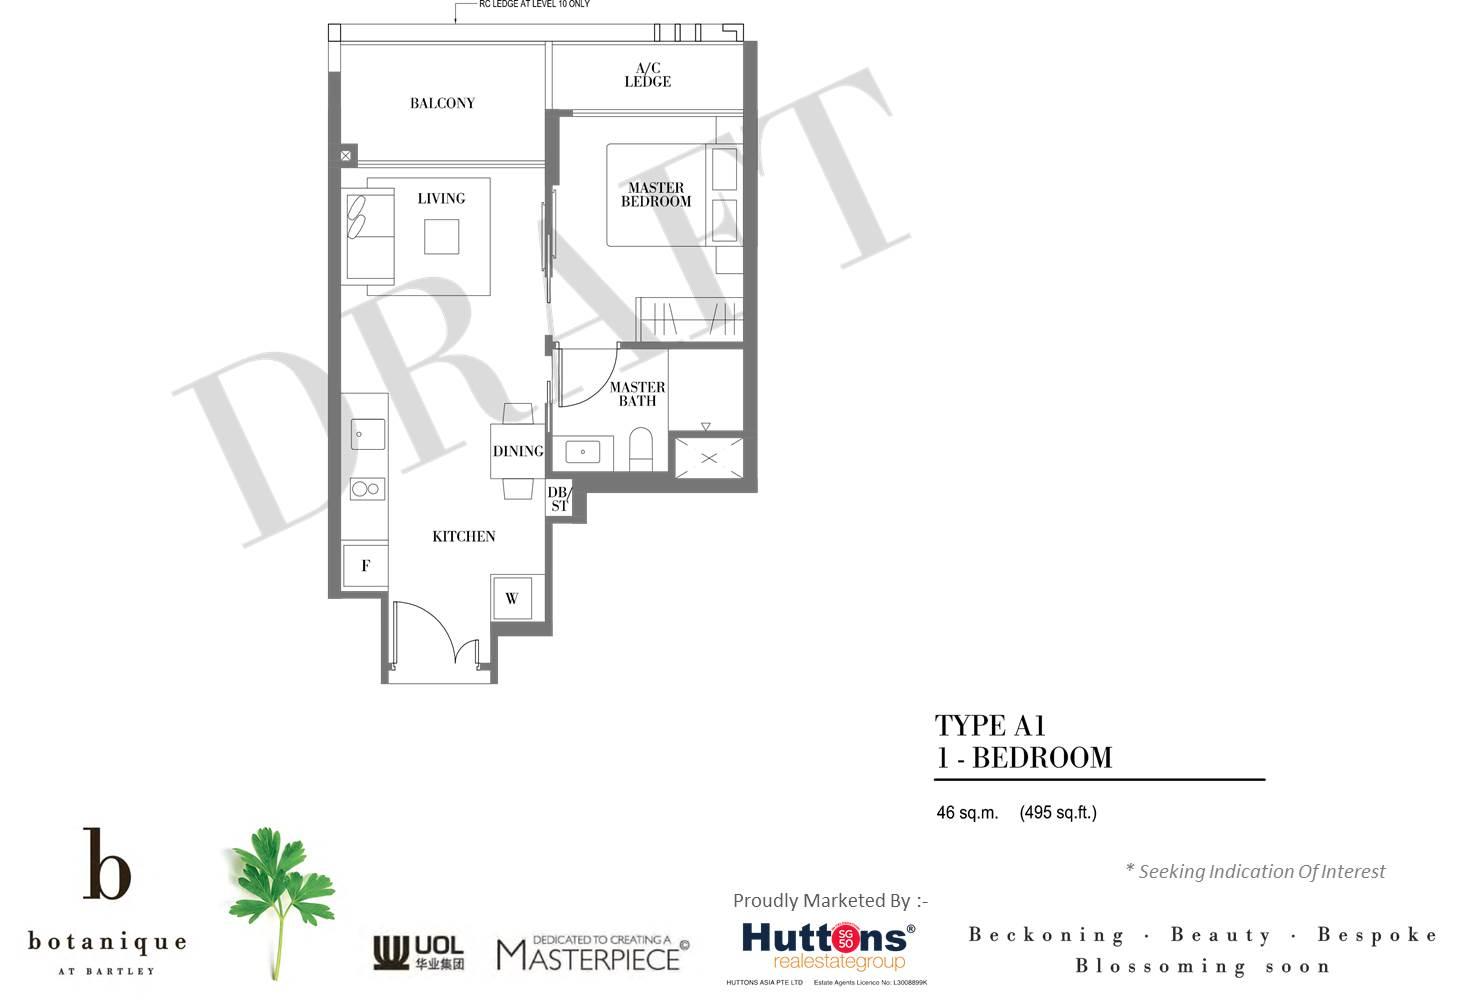 Botanique @ Bartley floor plans botanique @ bartley Botanique @ Bartley By UOL  Showflat Hotline +65 61007122  Bartley MRT 54ec29b0b86622015 02 24 03 35 12